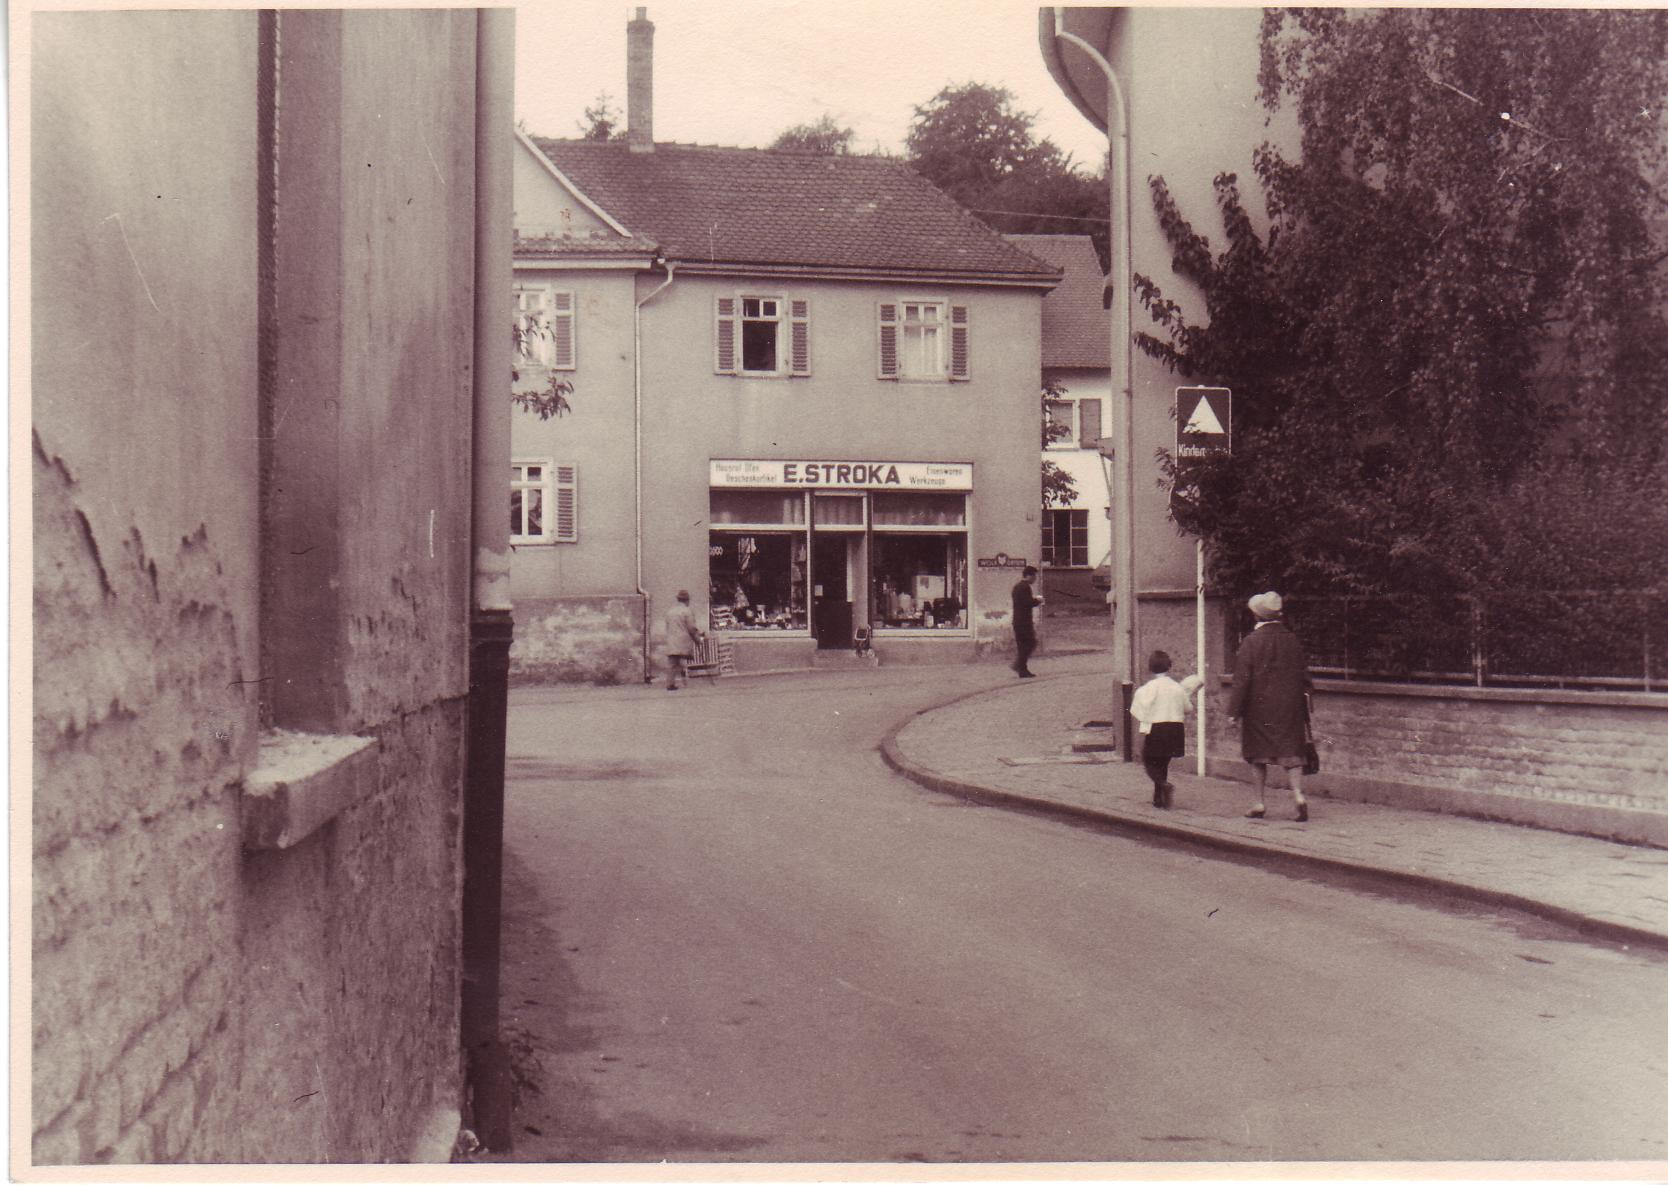 Hauptstrasse Stroka Laden 1962